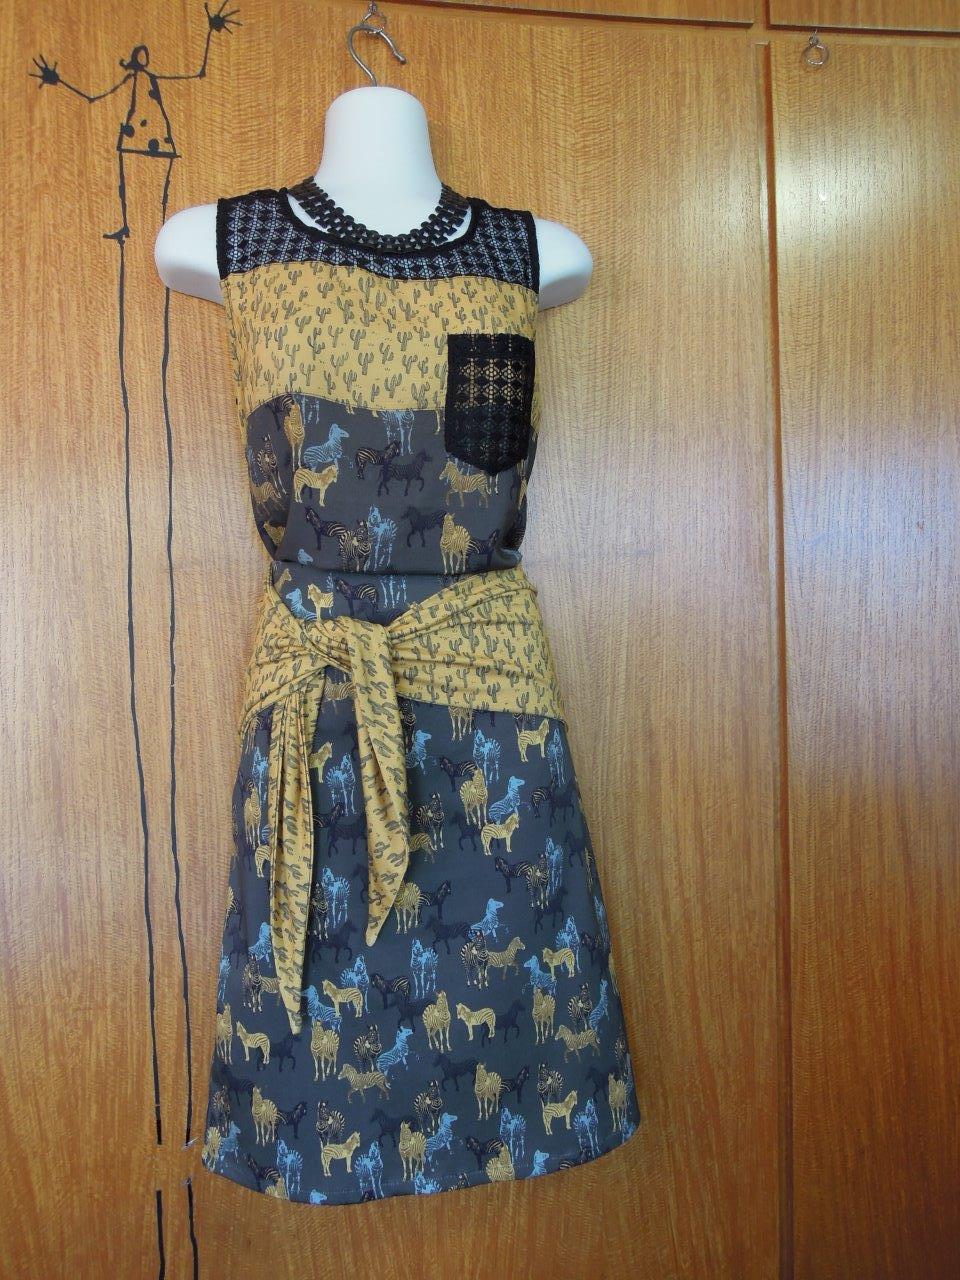 dressing-des-tendances-robe-ruban-noumea-nouvelle-caledonie.nc.jpg